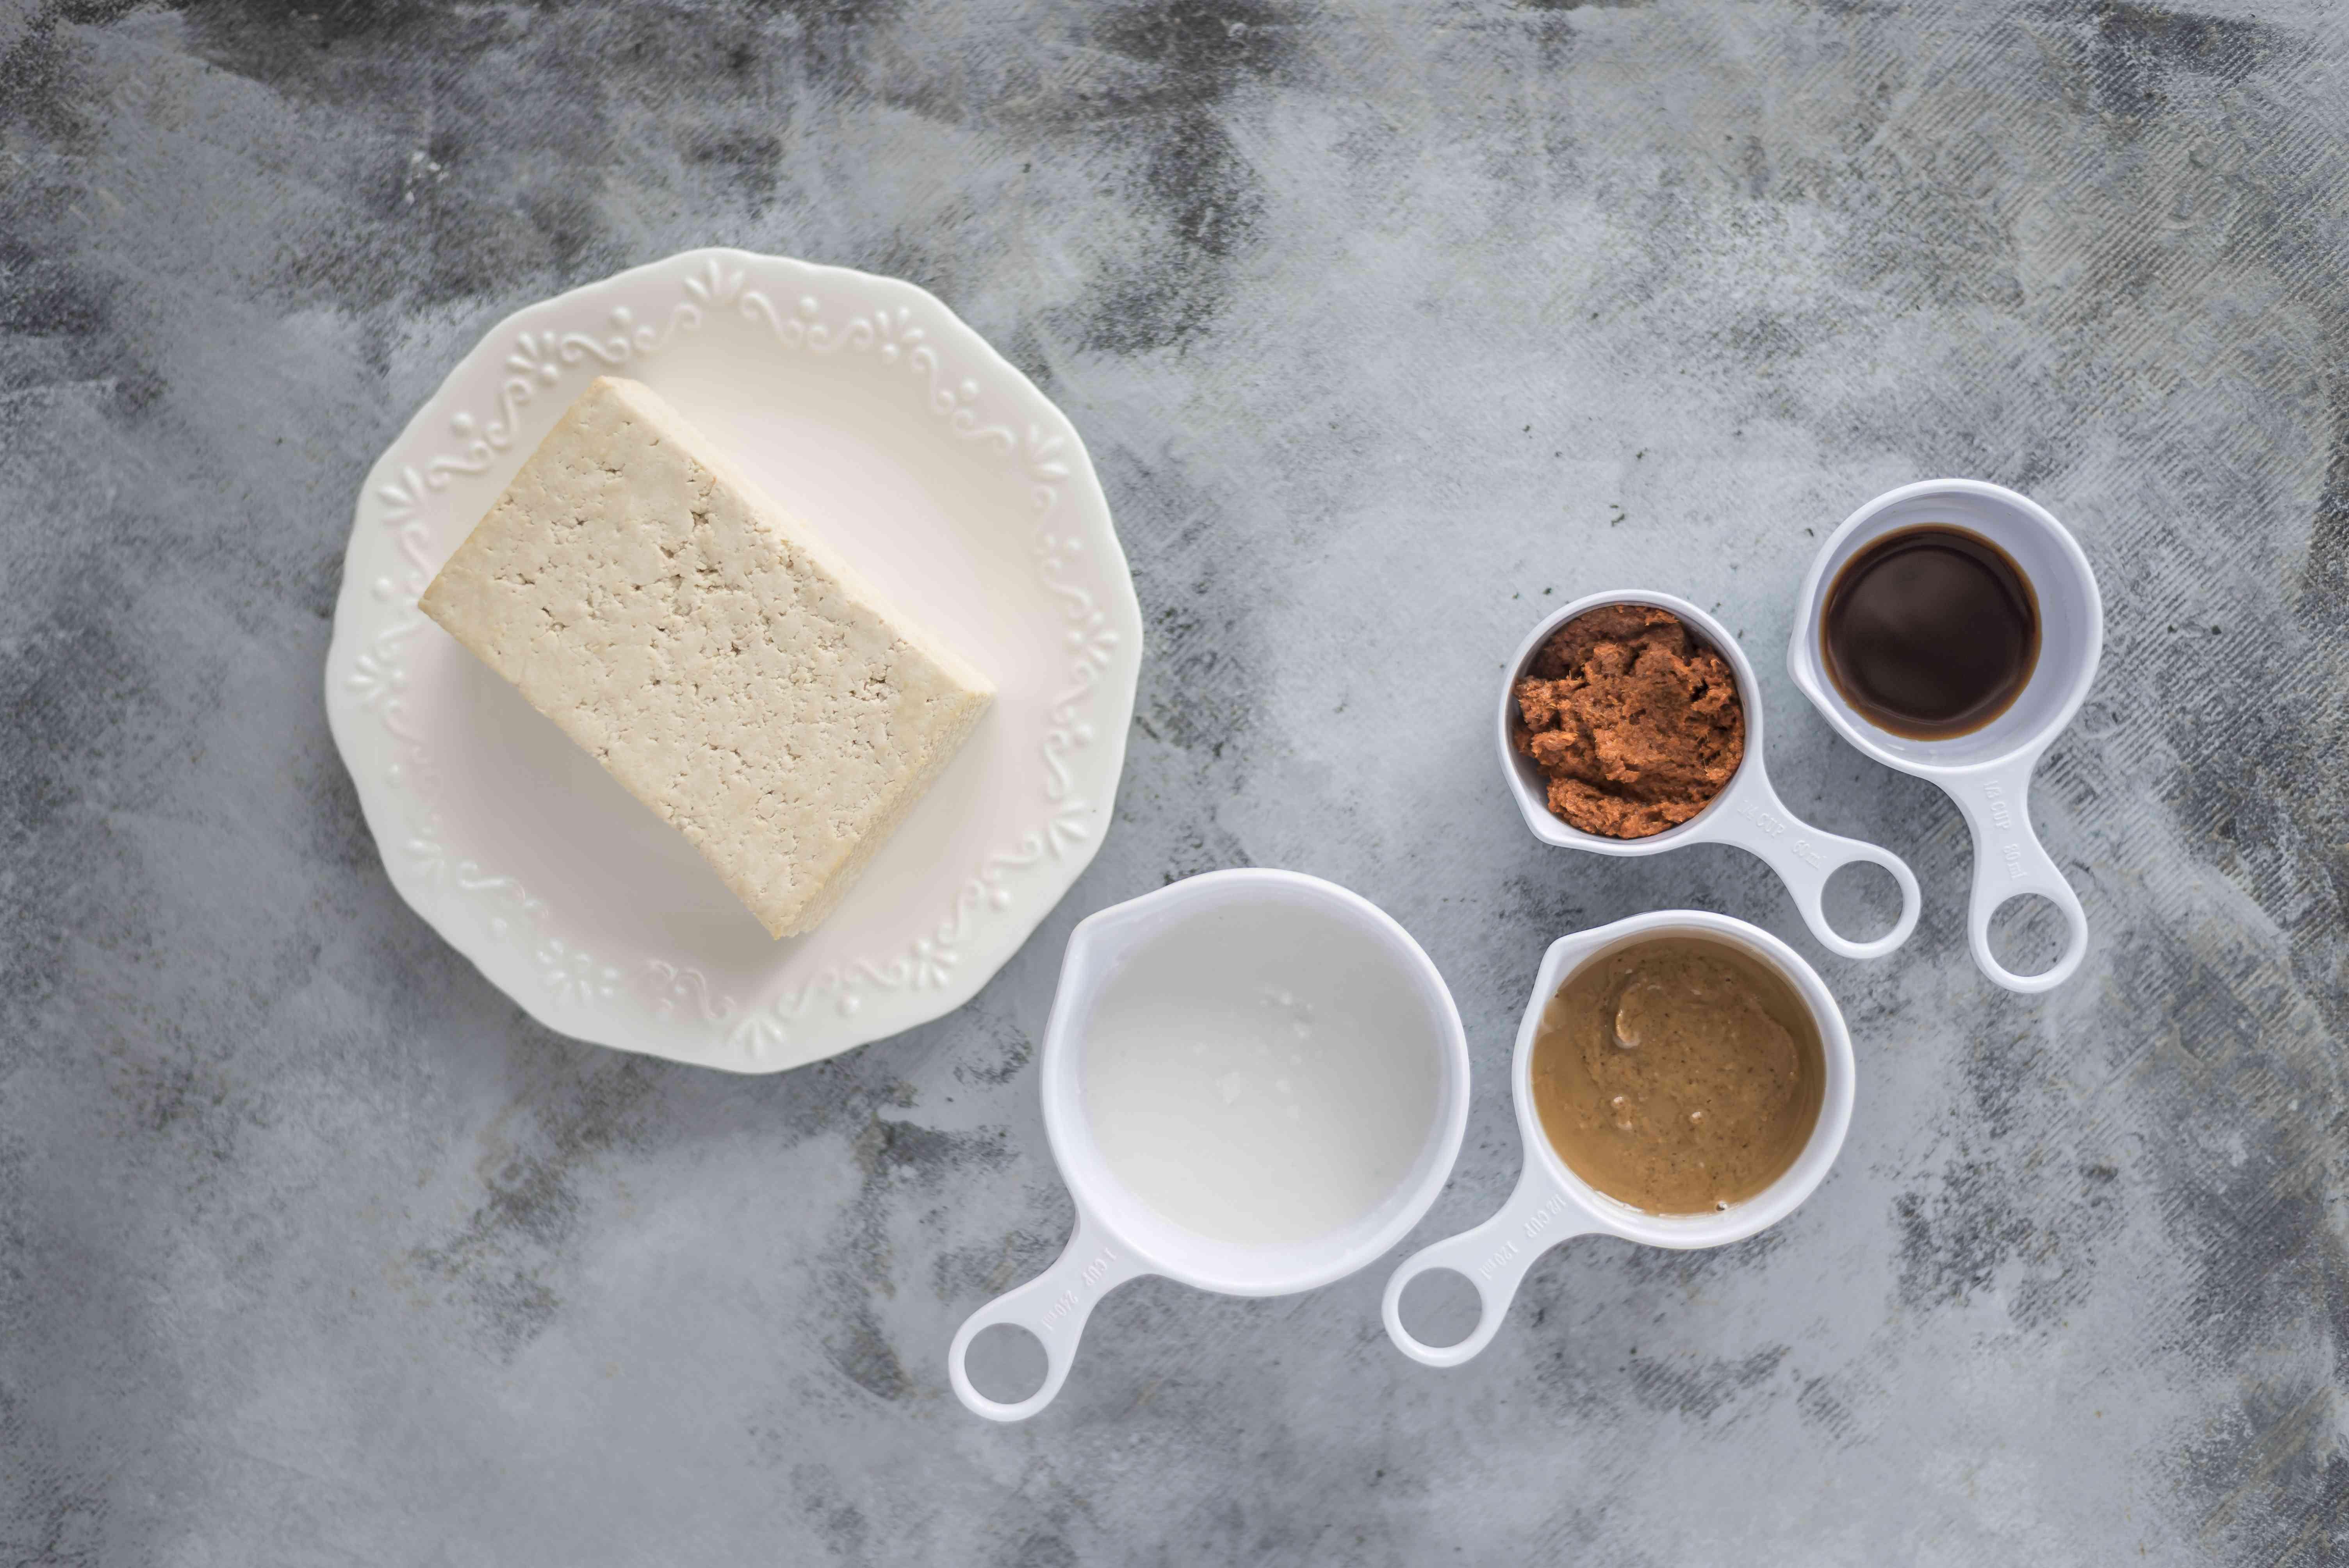 Ingredients for tofu satay